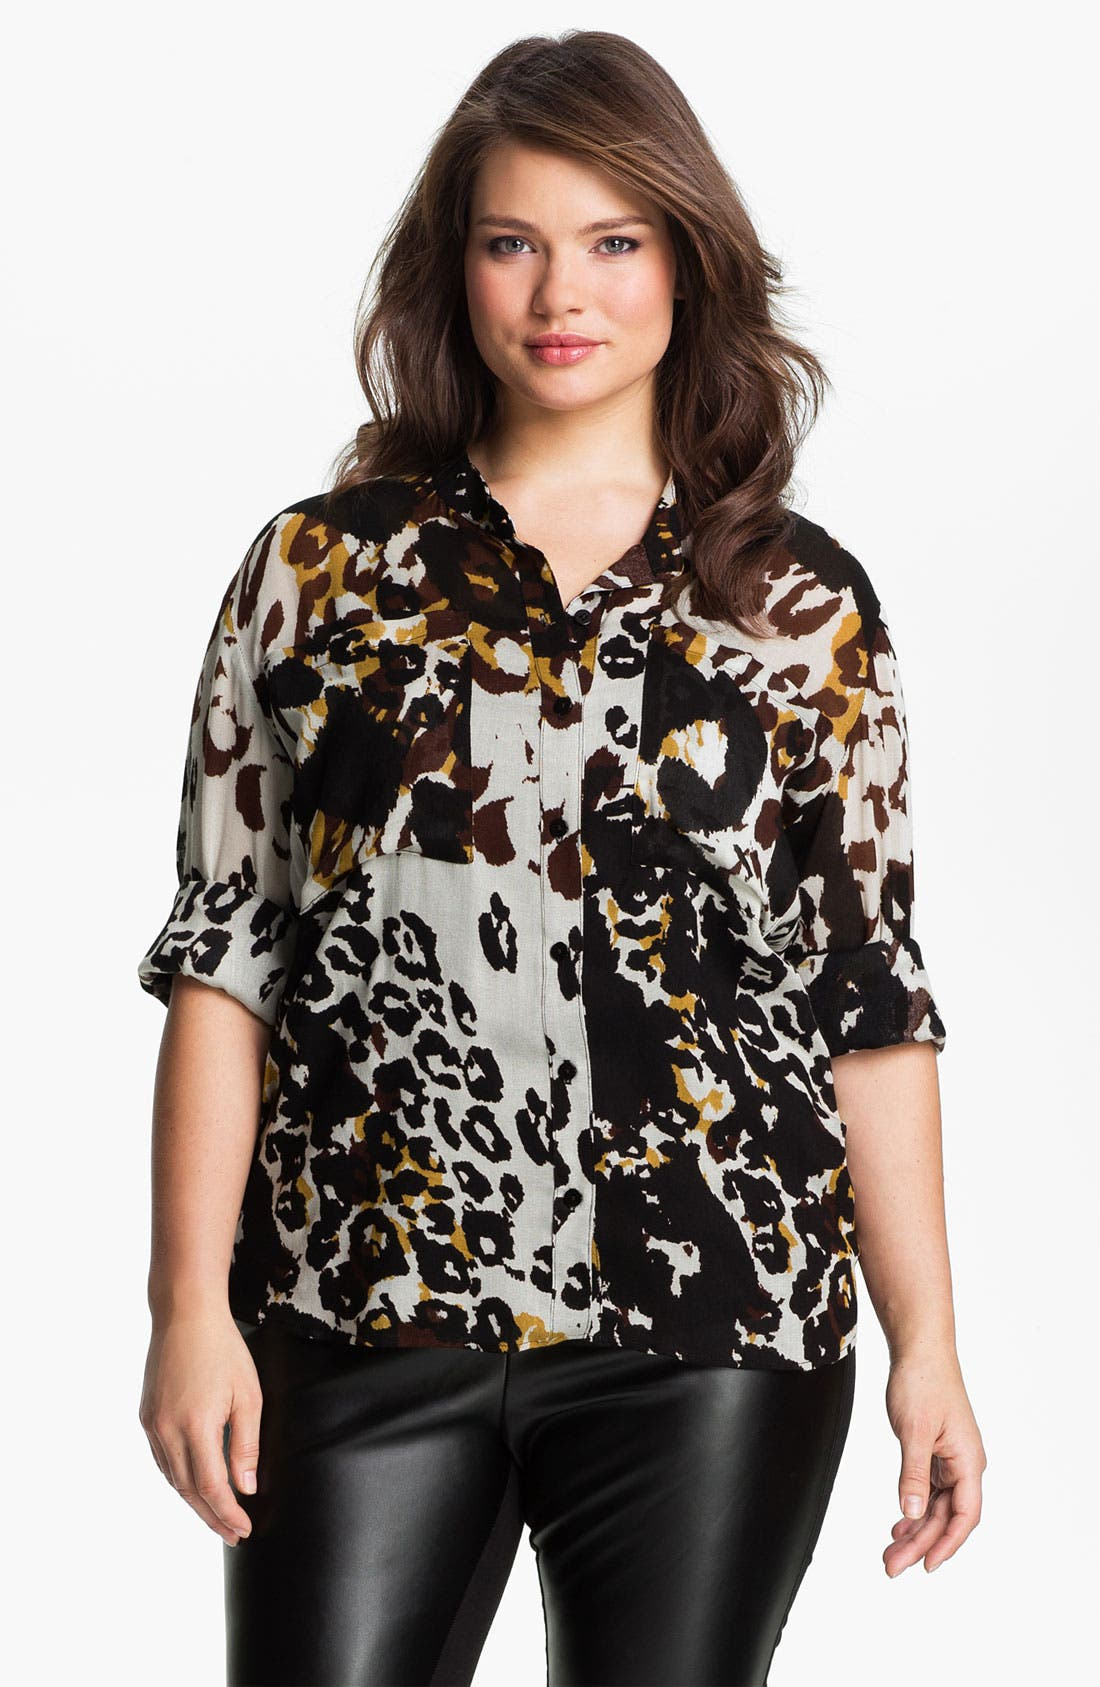 Alternate Image 1 Selected - Nation LTD 'Sonoma' Leopard Print Shirt (Plus)